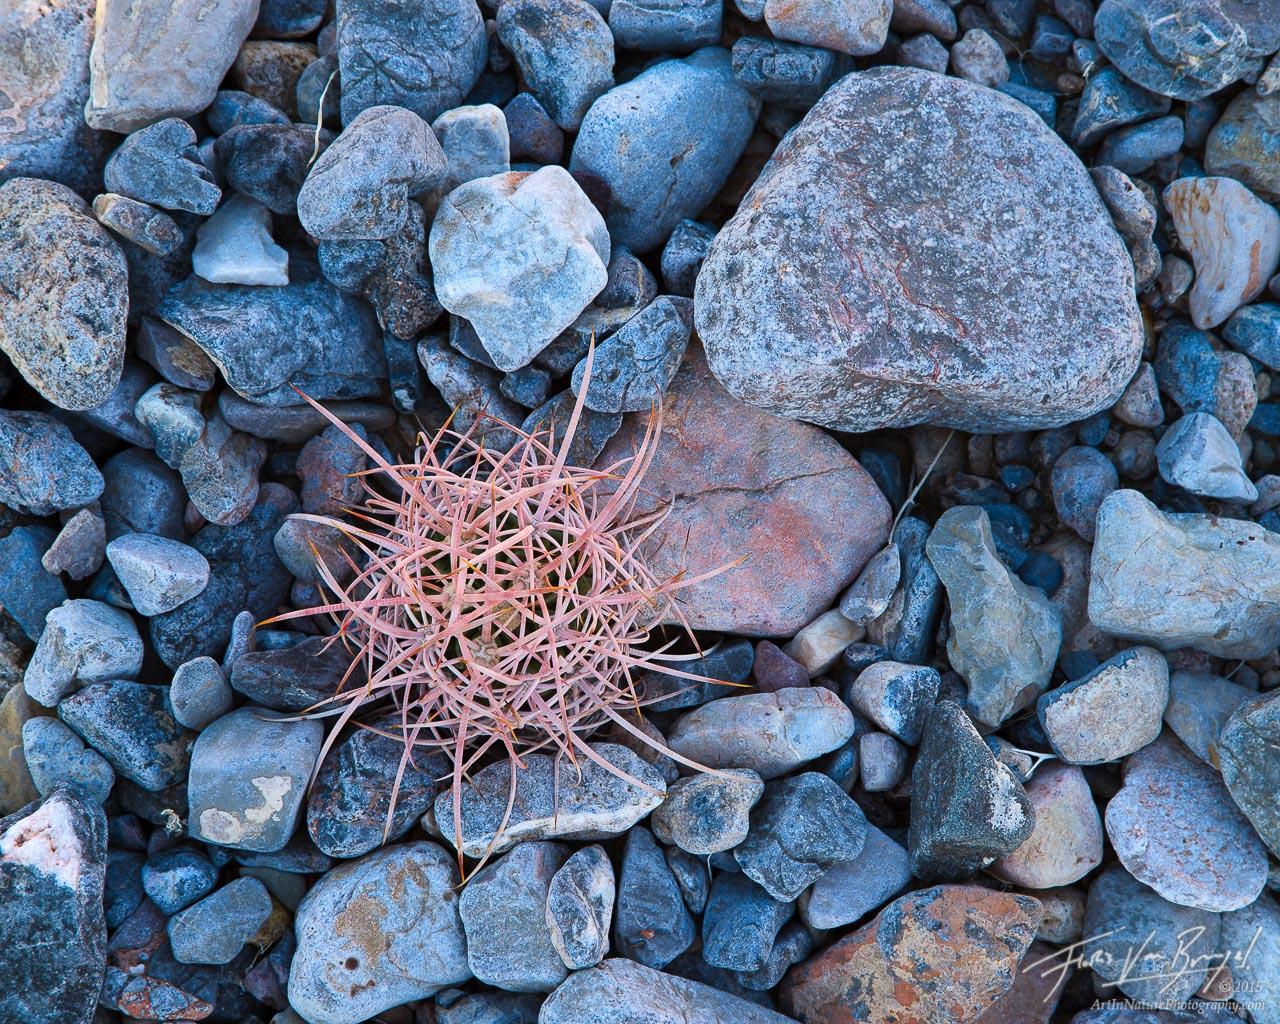 Barrel Cactus, Death Valley National Park, California , photo